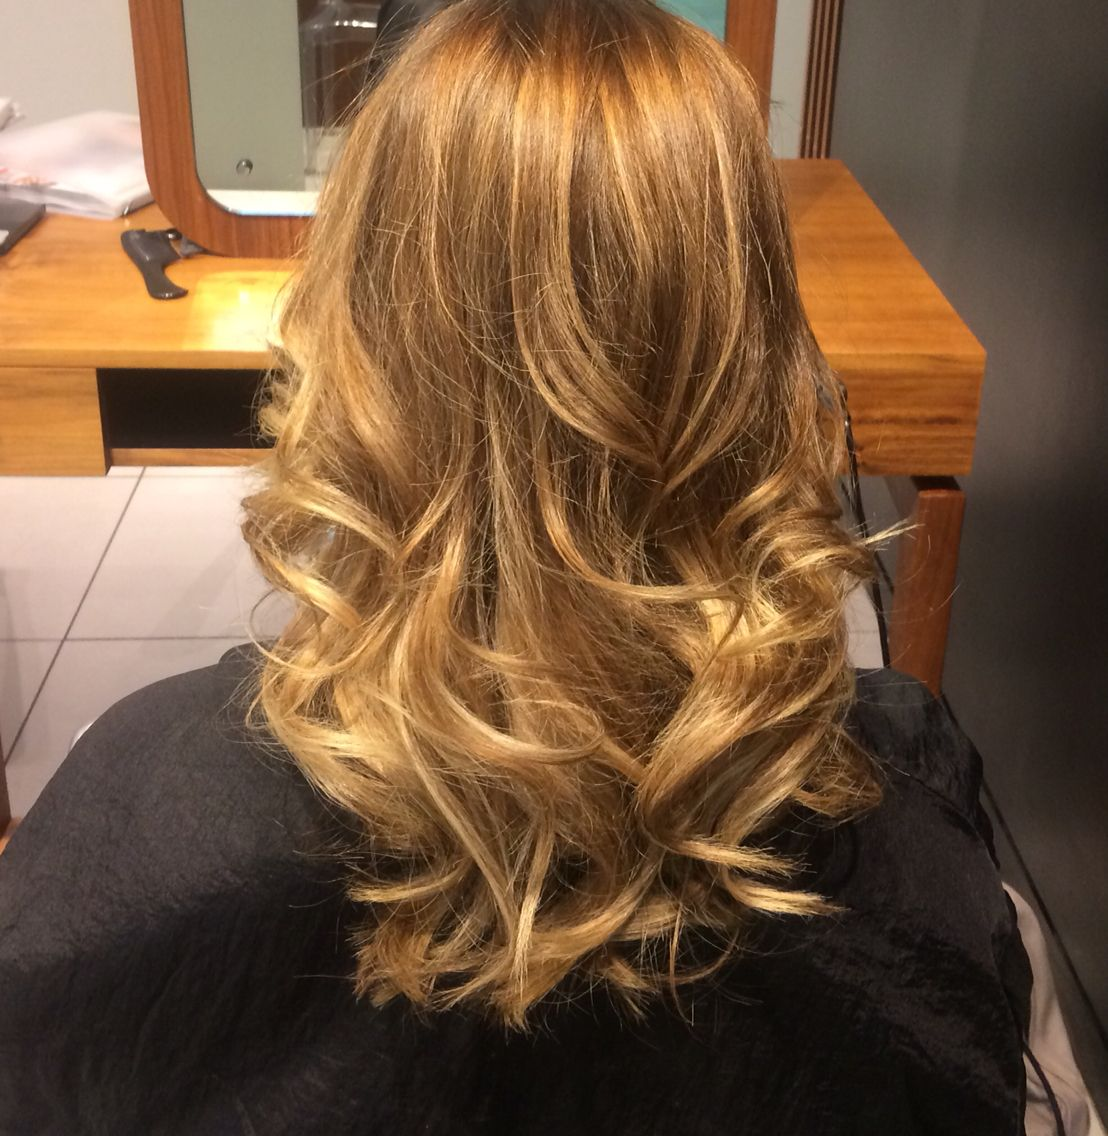 Ballayage Blond pour ballayage #freelights #waleshair #aveda @philcogin #bronde